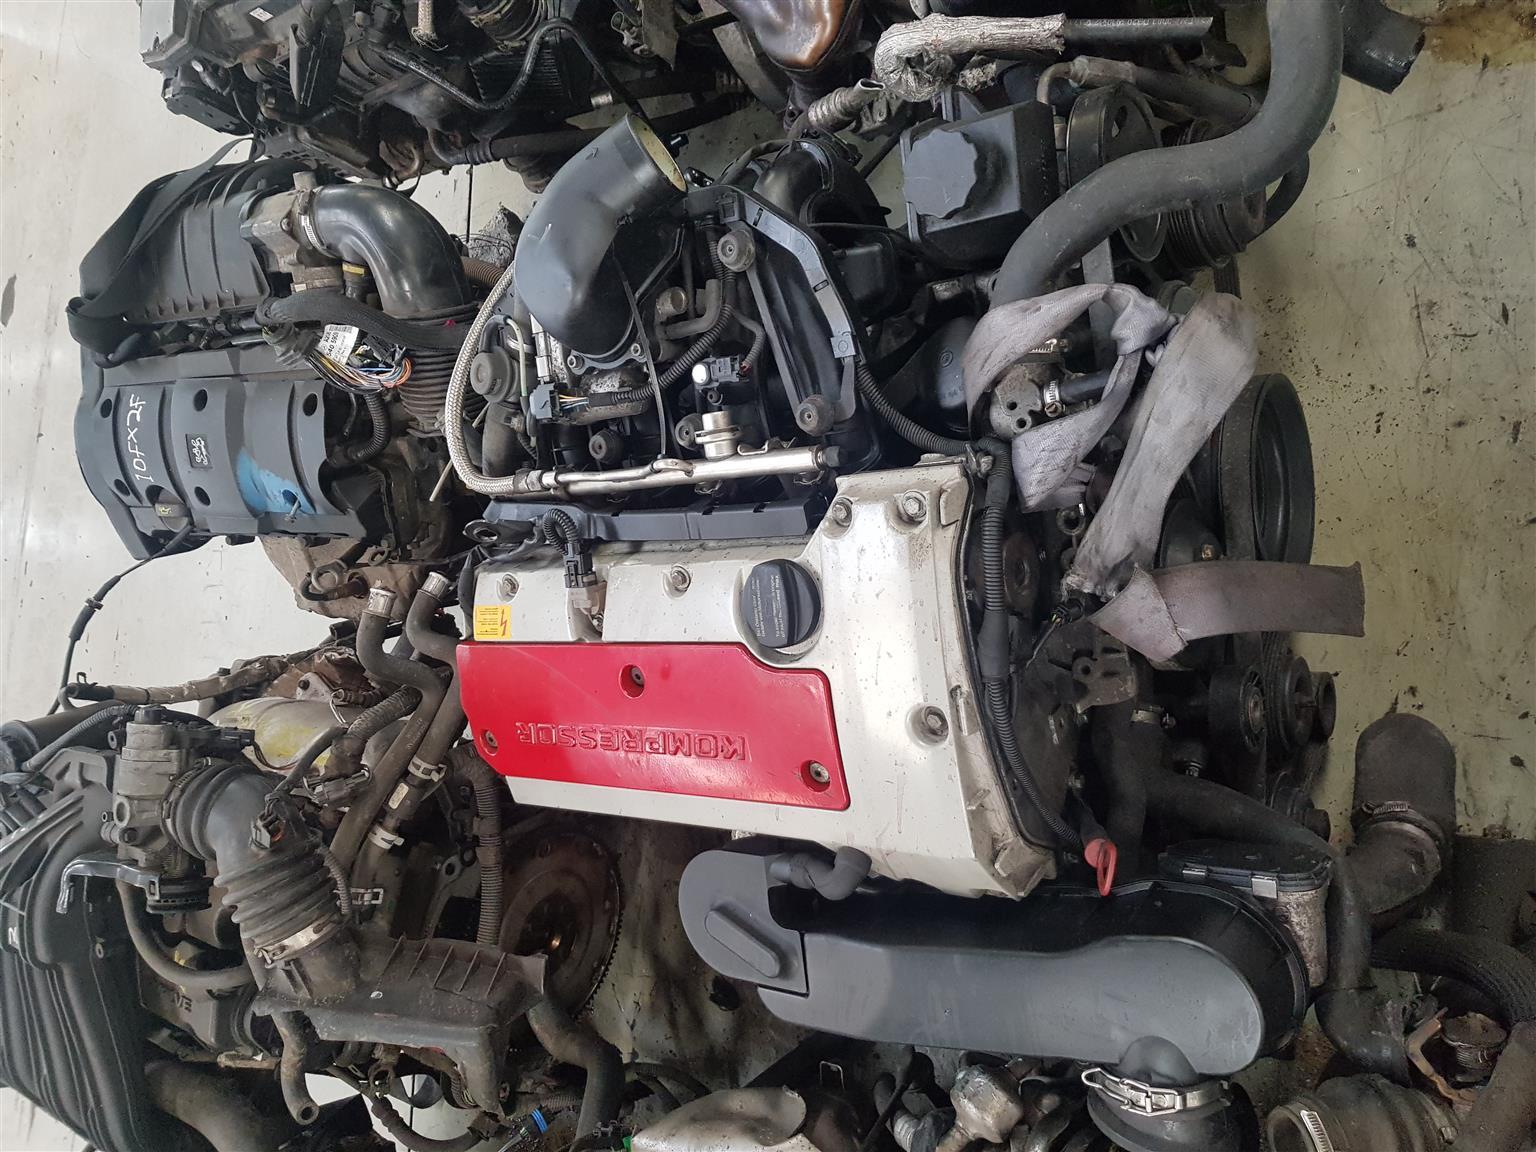 MERCEDES BENZ C230K E230 (111956) ENGINE FOR SALE